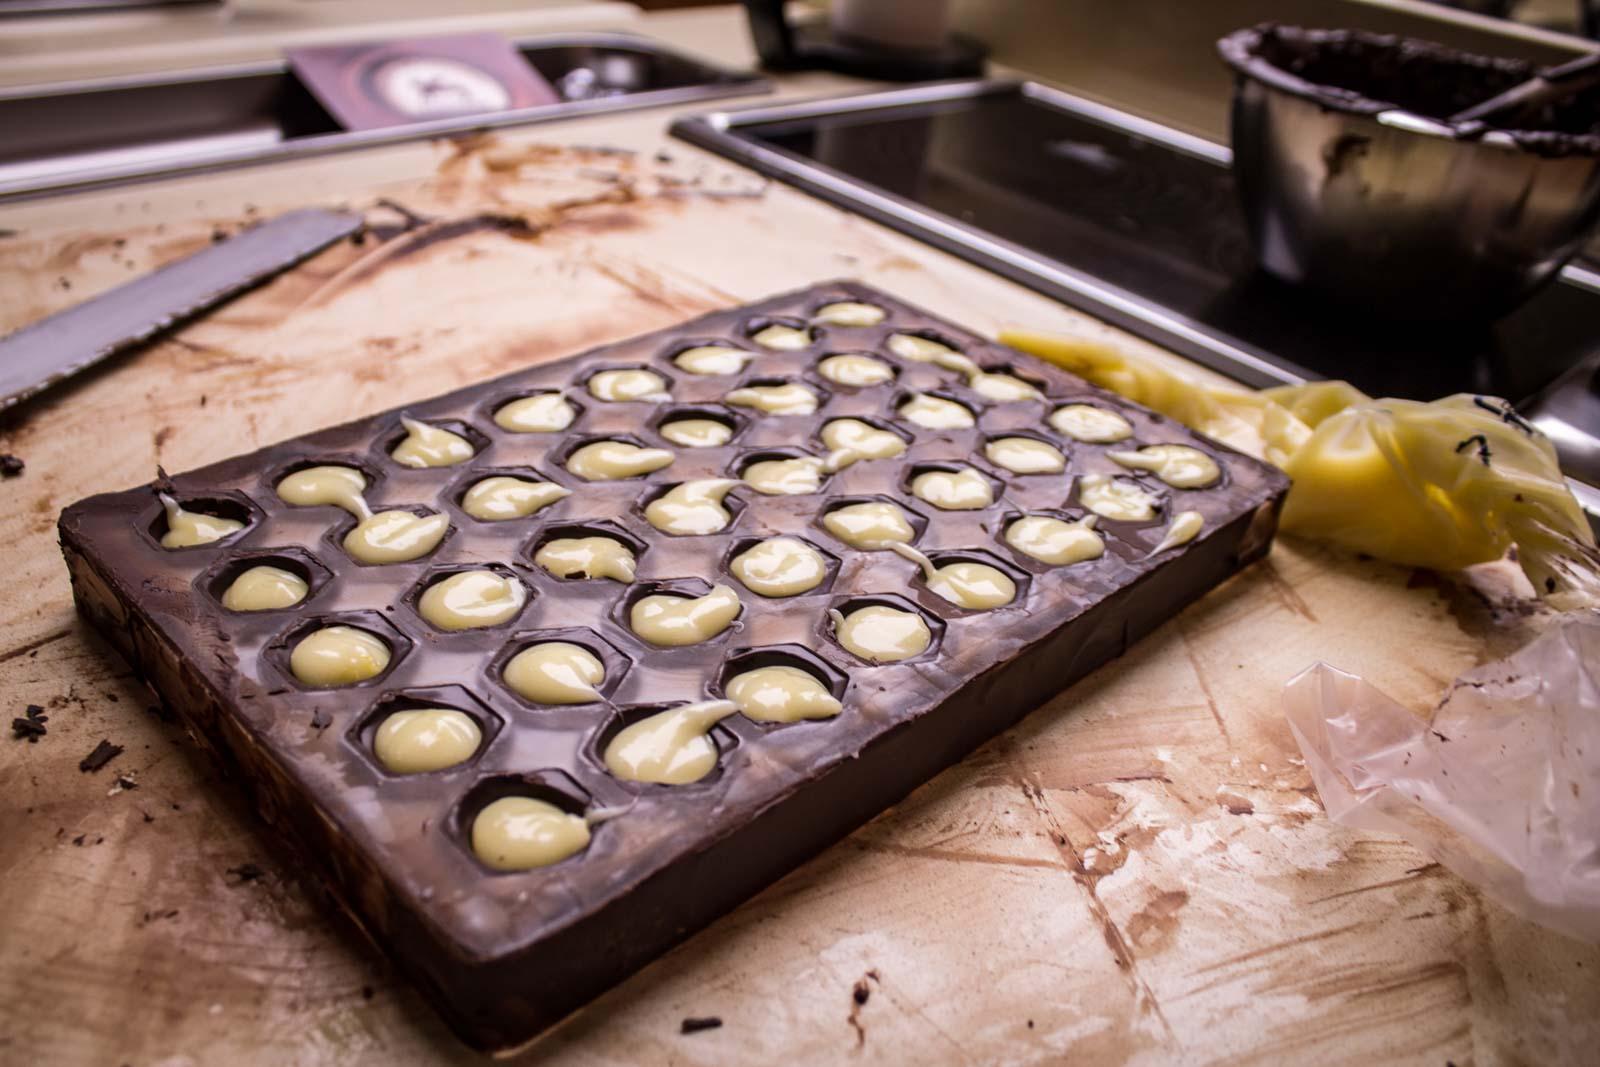 perugina factory, chocolate factory, perugia, baci chocolates, Umbria, Italy